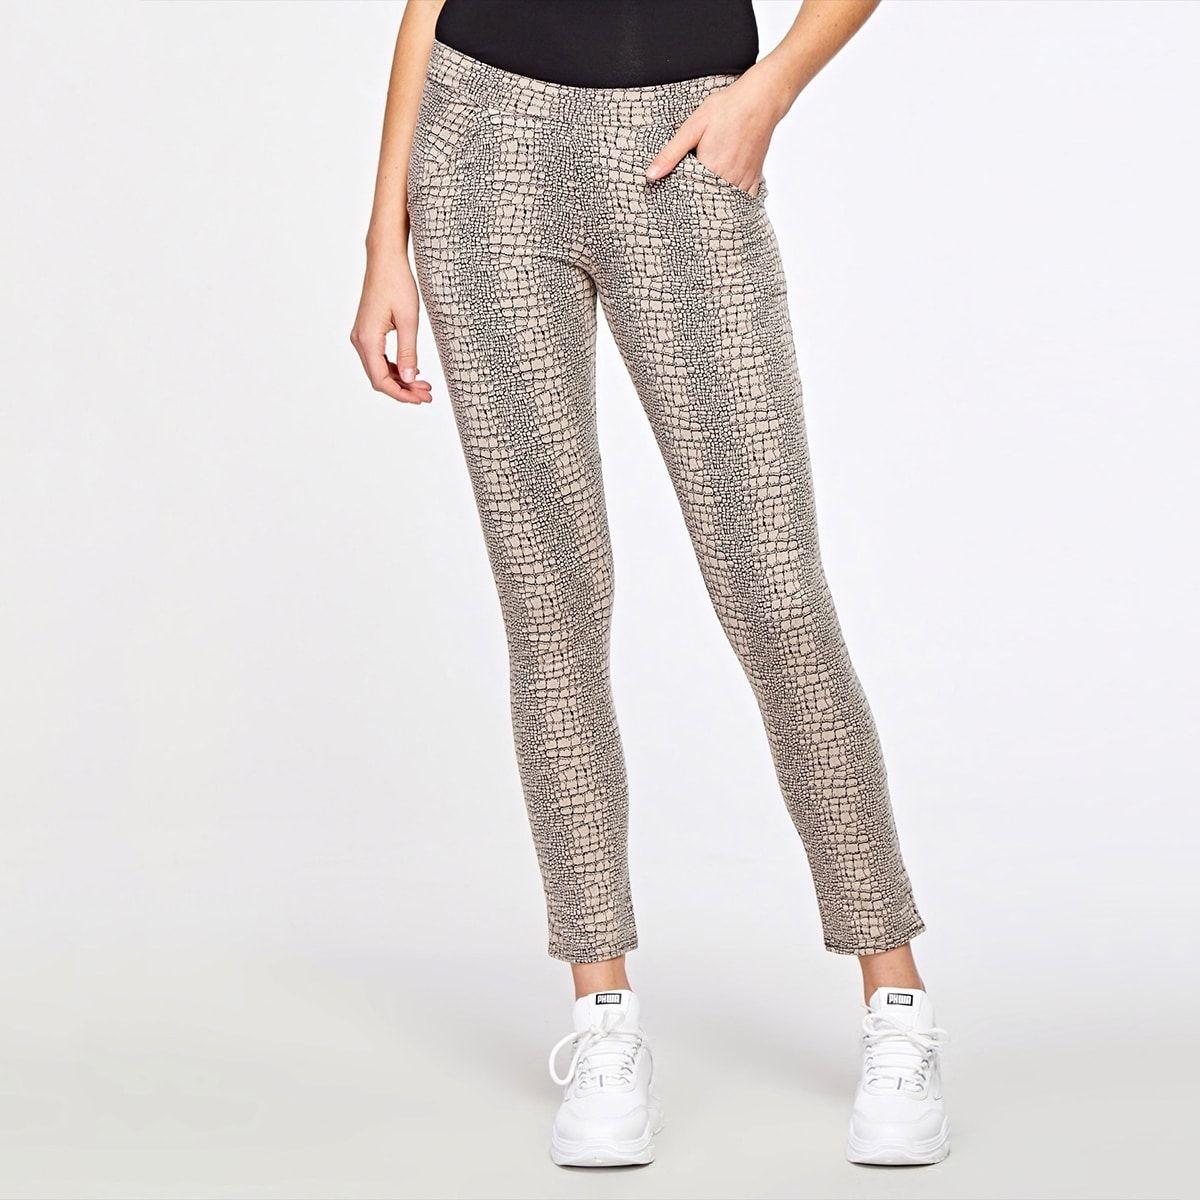 17 00 Pantalones Con Bolsillo Oblicuo Pantalones Ofertas Modamujer Shein Fashion Fashion Pants Sweatpants